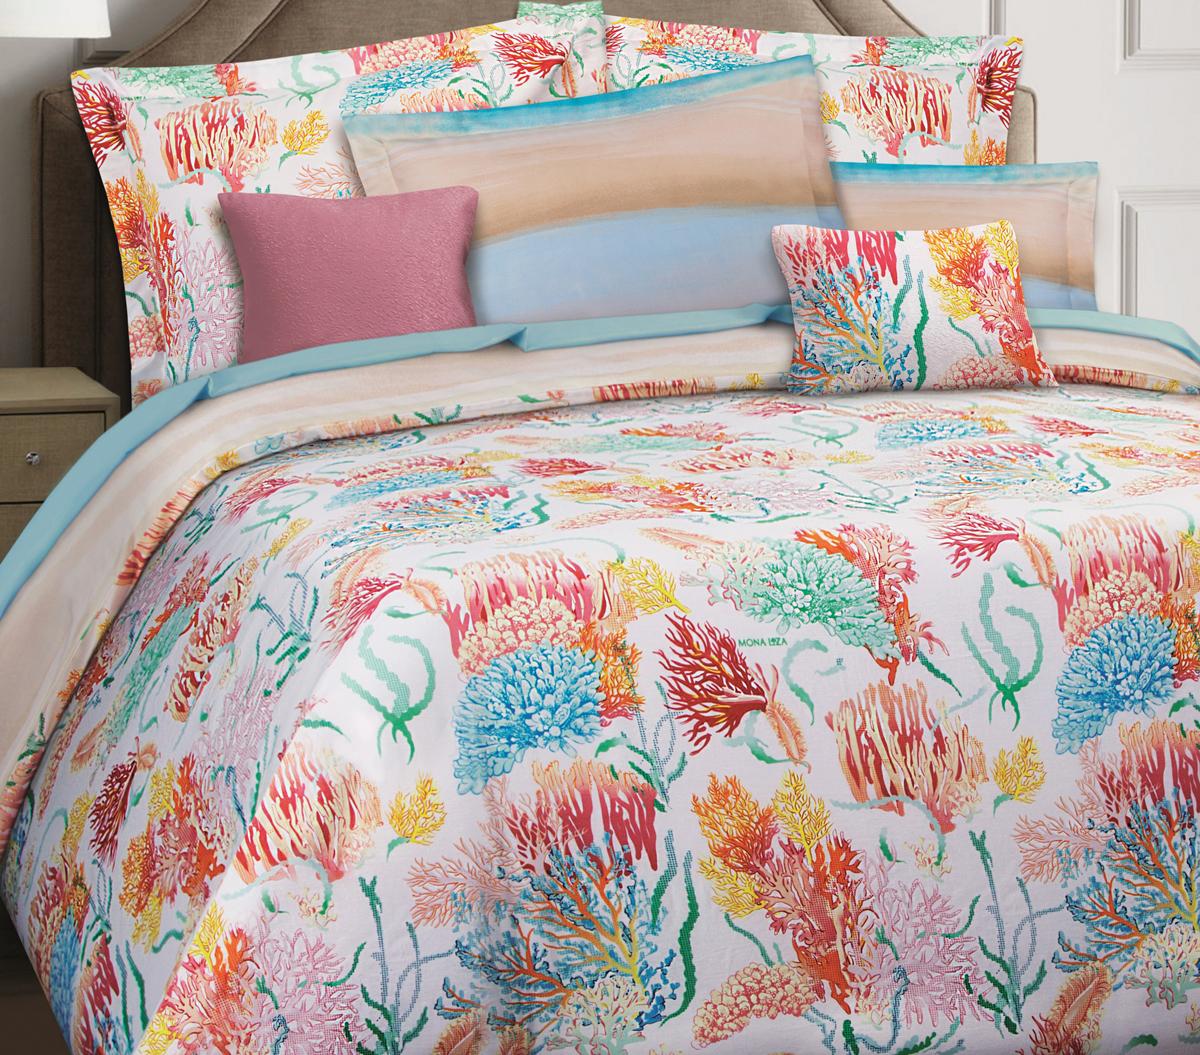 Комплект белья Mona Liza Premium Atelier Sirena, 2-спальный, наволочки 50х70, 70х70. 5044-0016 цена